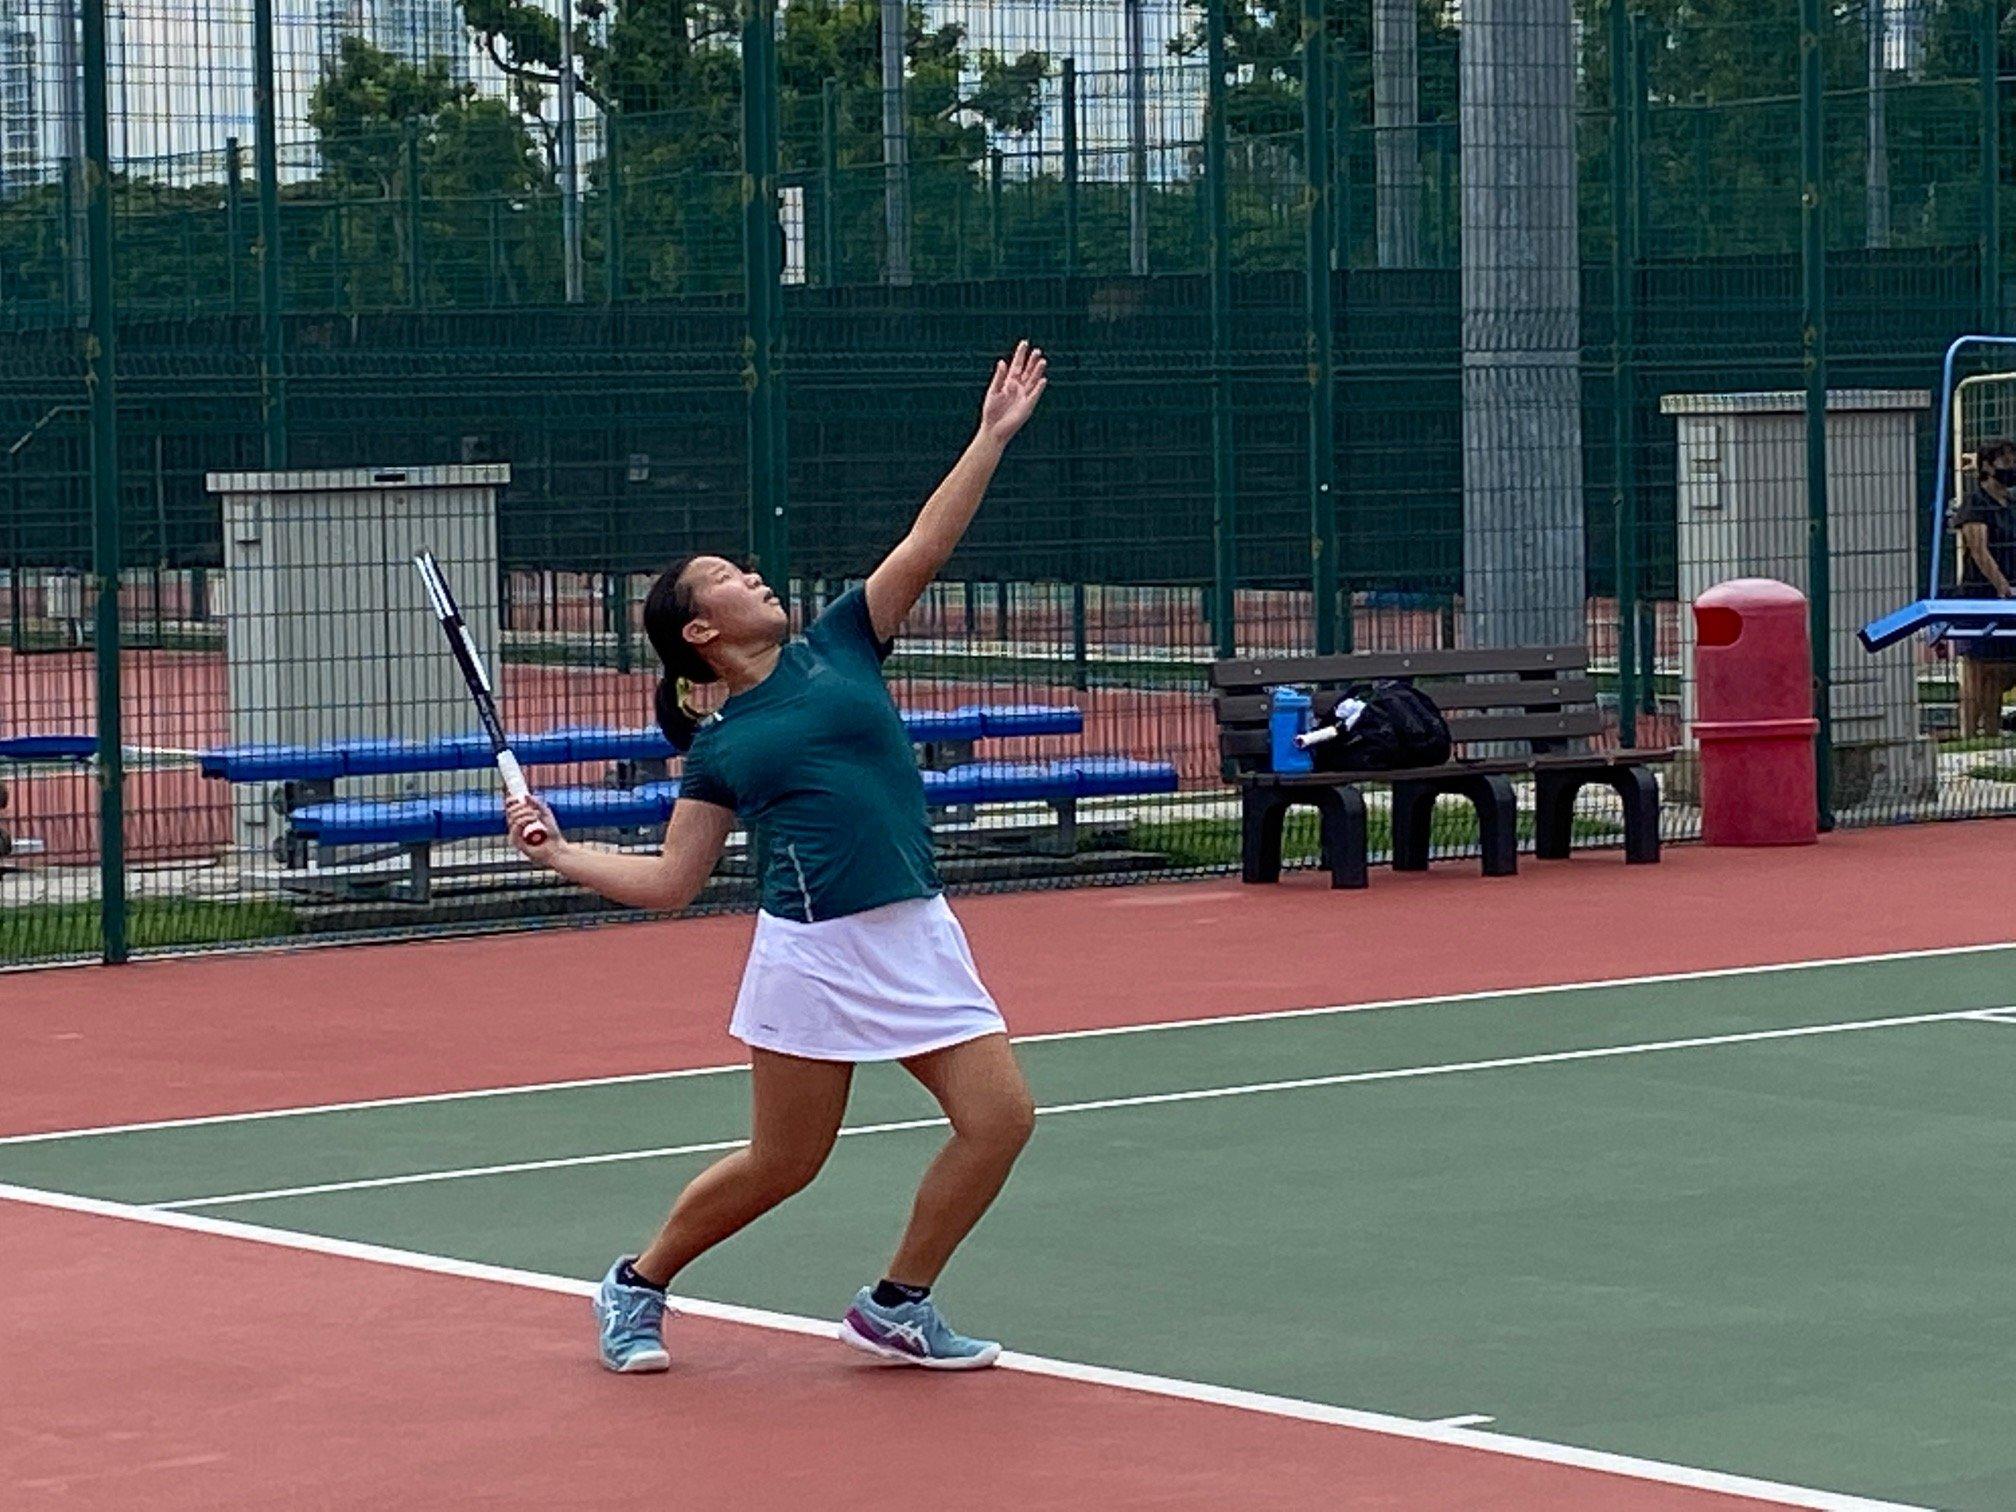 NSG B Div girls tennis final - SCGS second singles player Sarah Chan